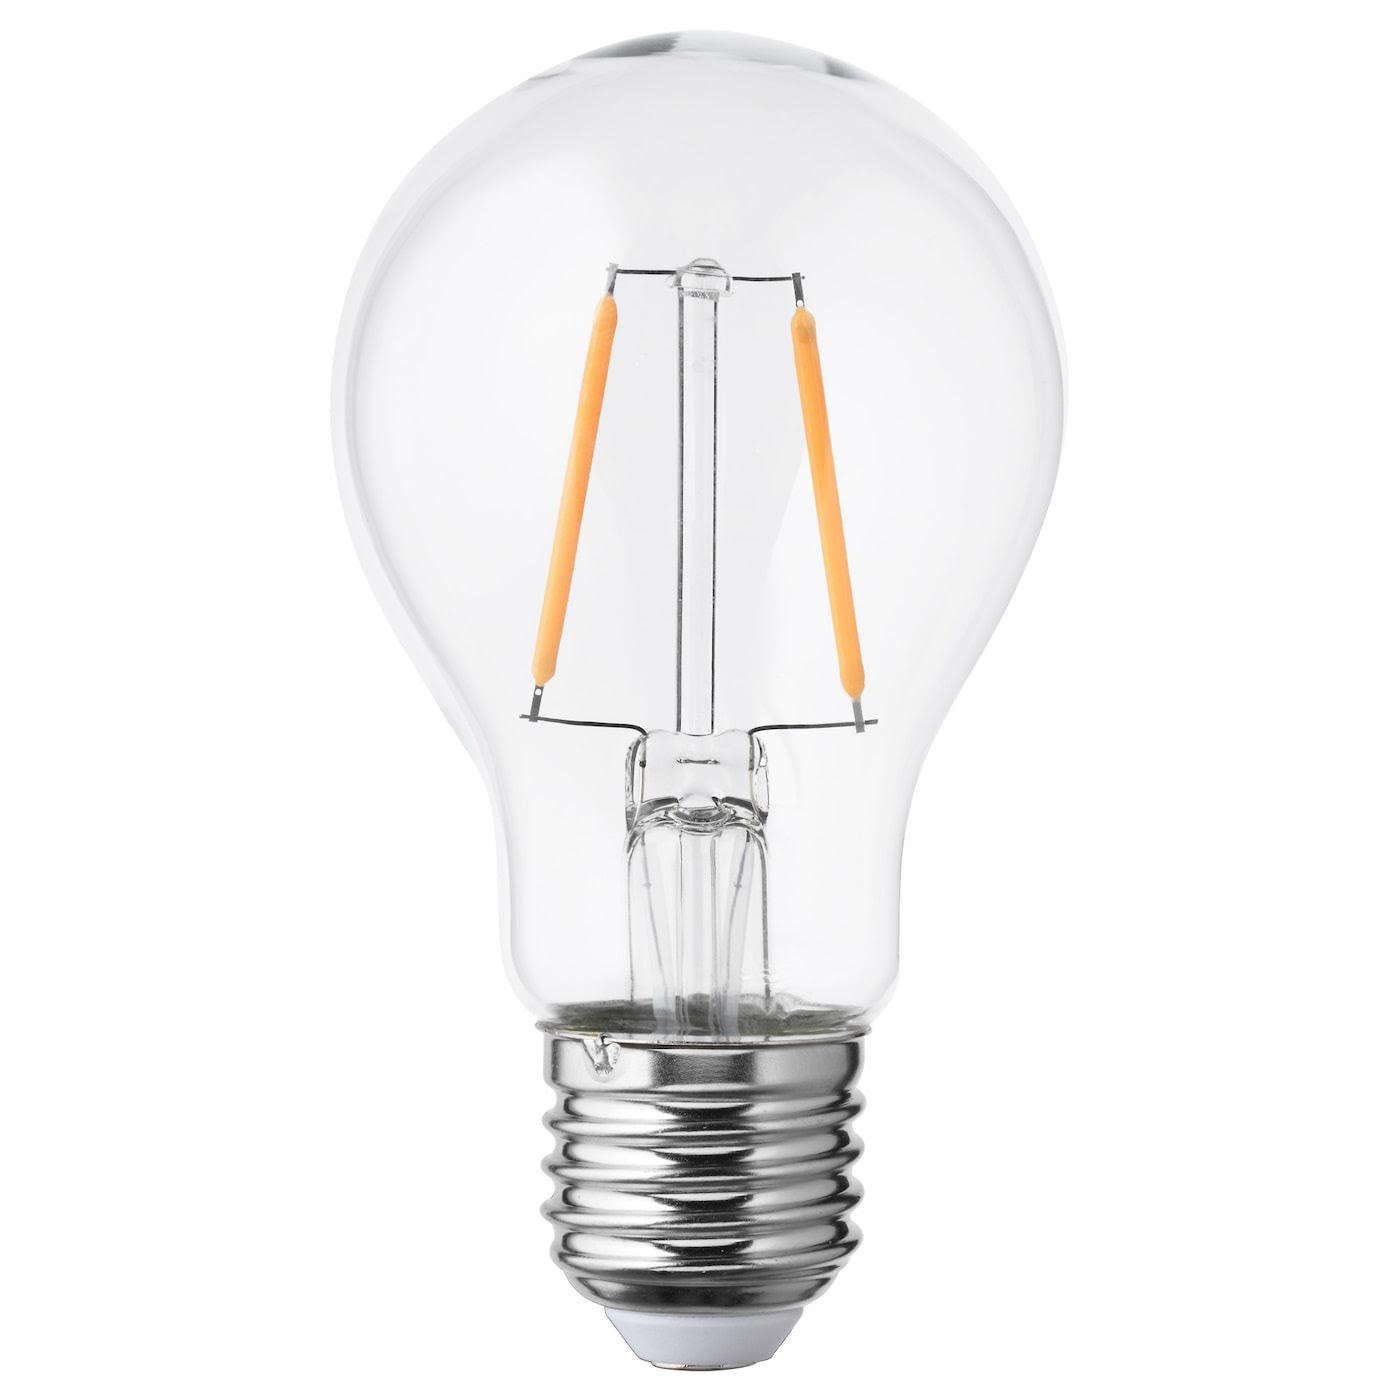 LUNNOM LED bulb E27 100 lumen Globe clear glass 60 mm - IKEA